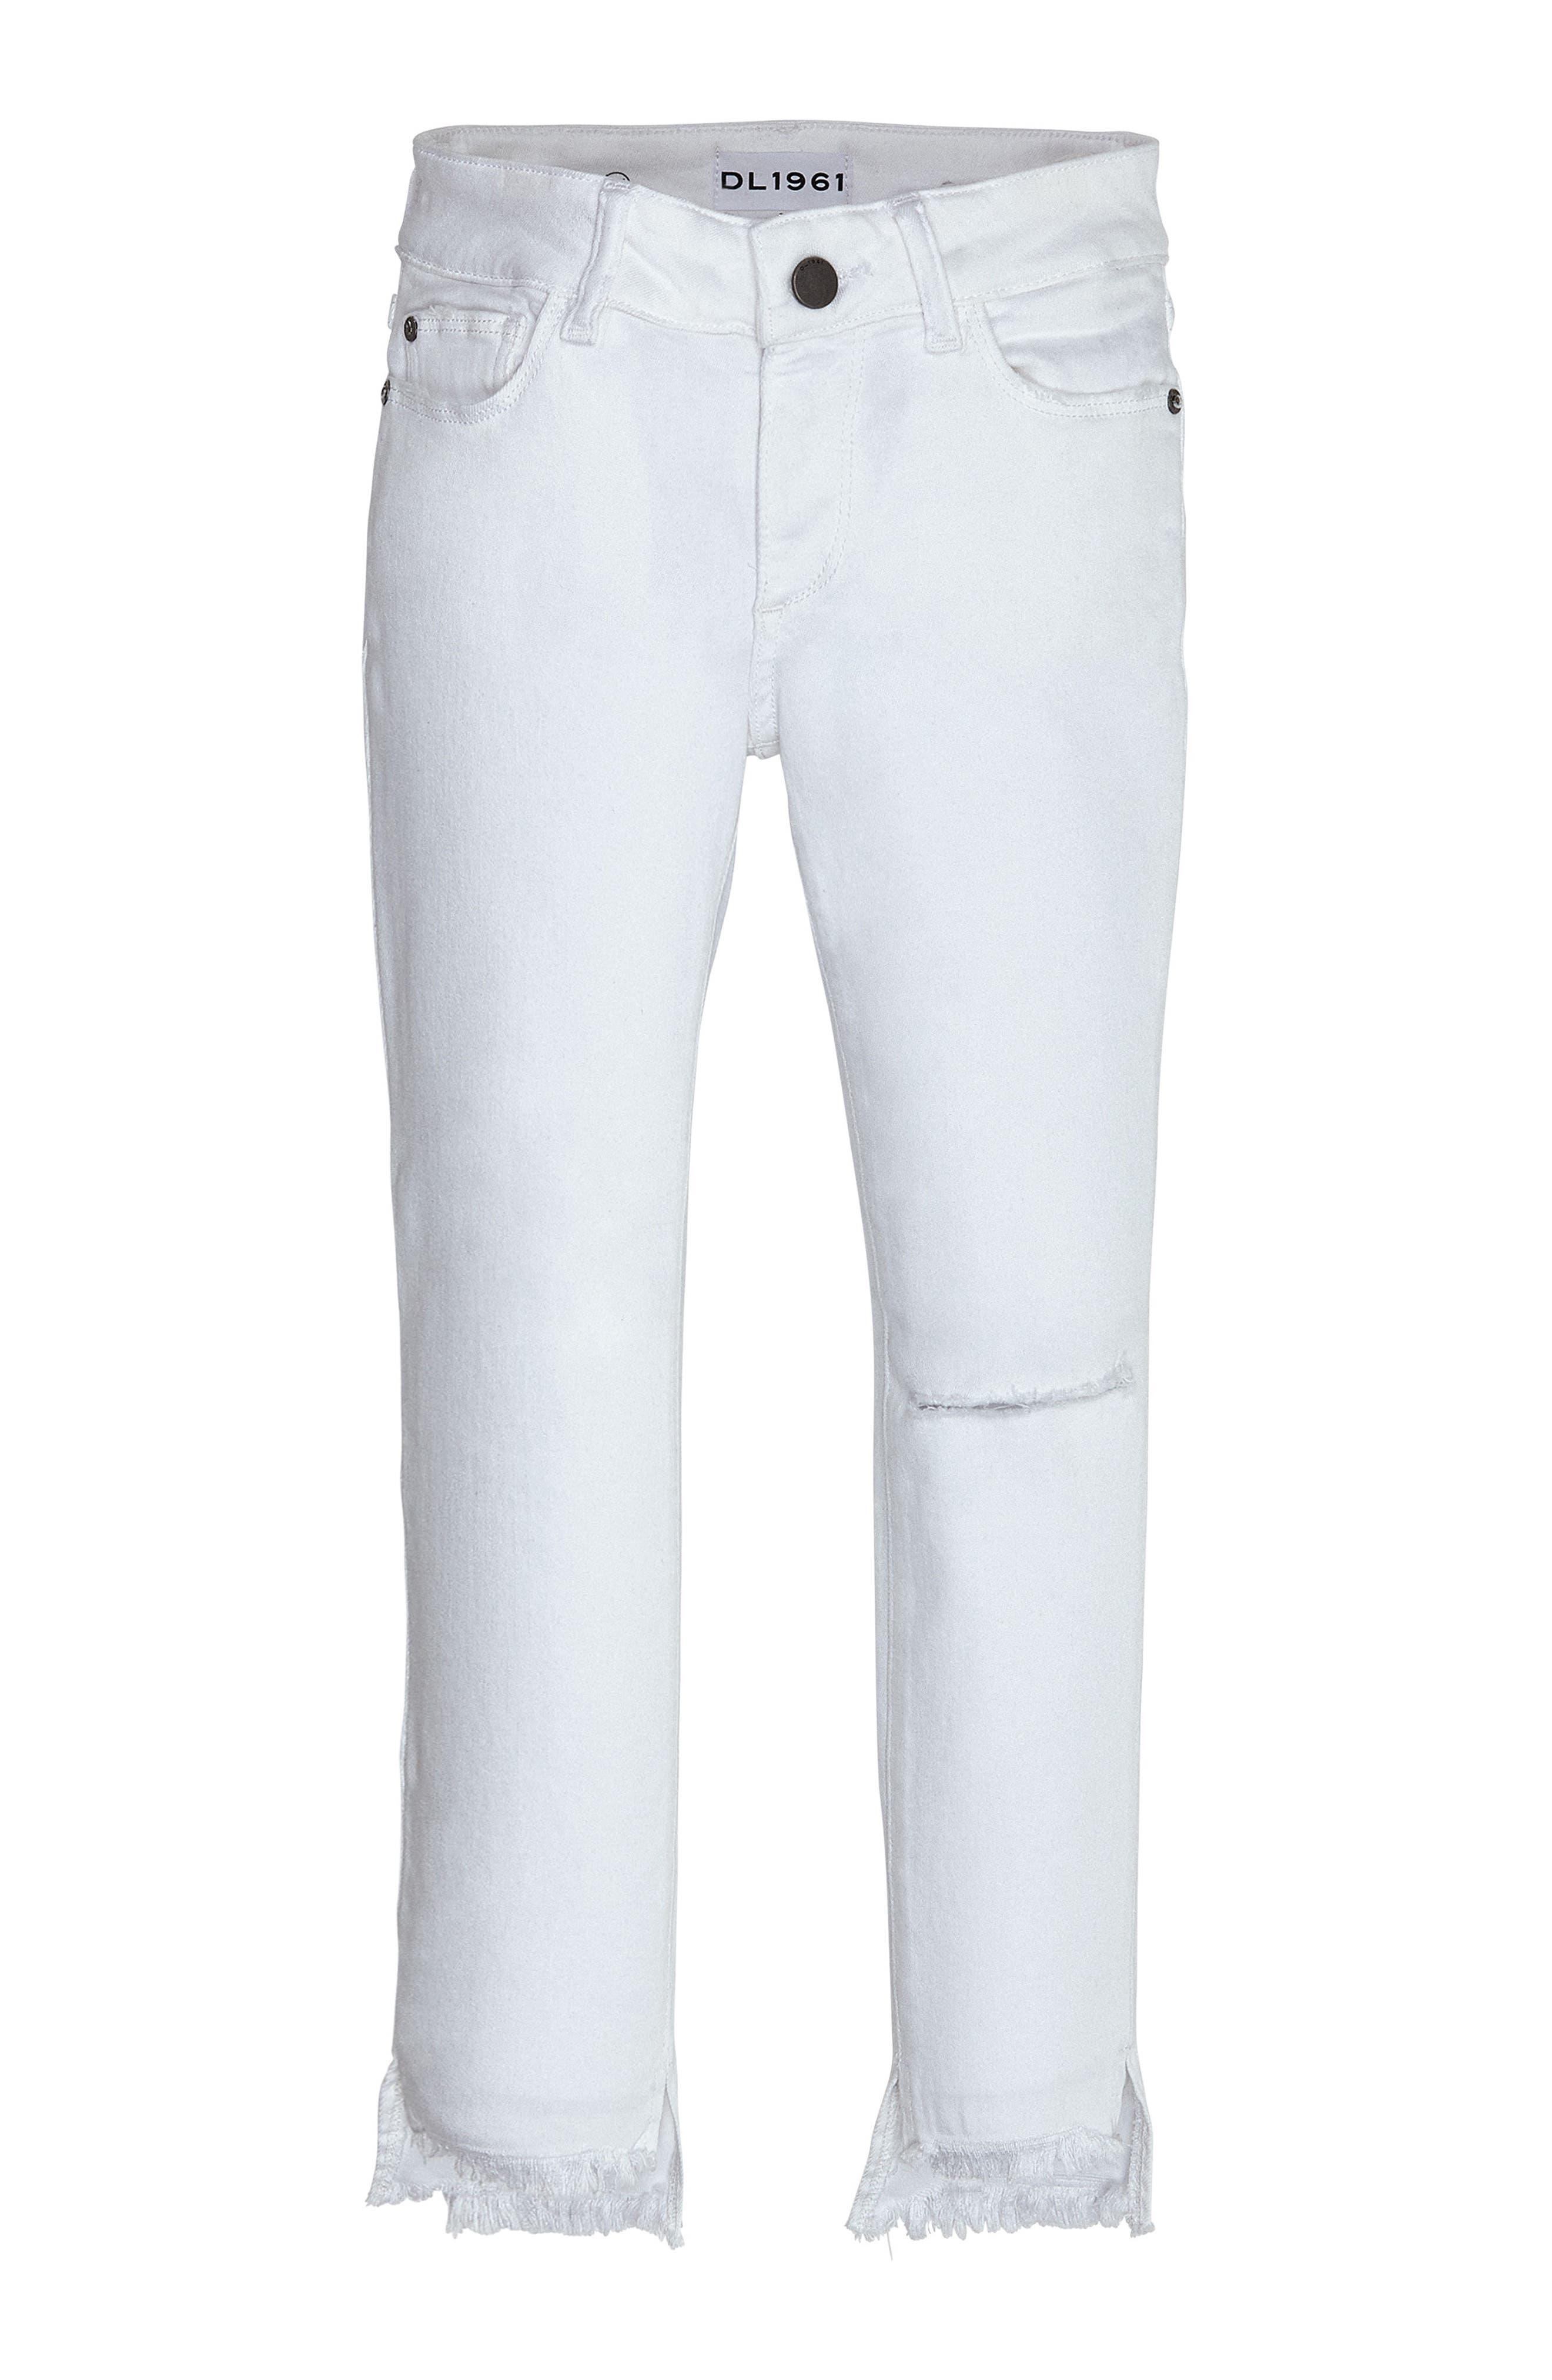 Main Image - DL1961 Distressed Skinny Jeans (Big Girls)